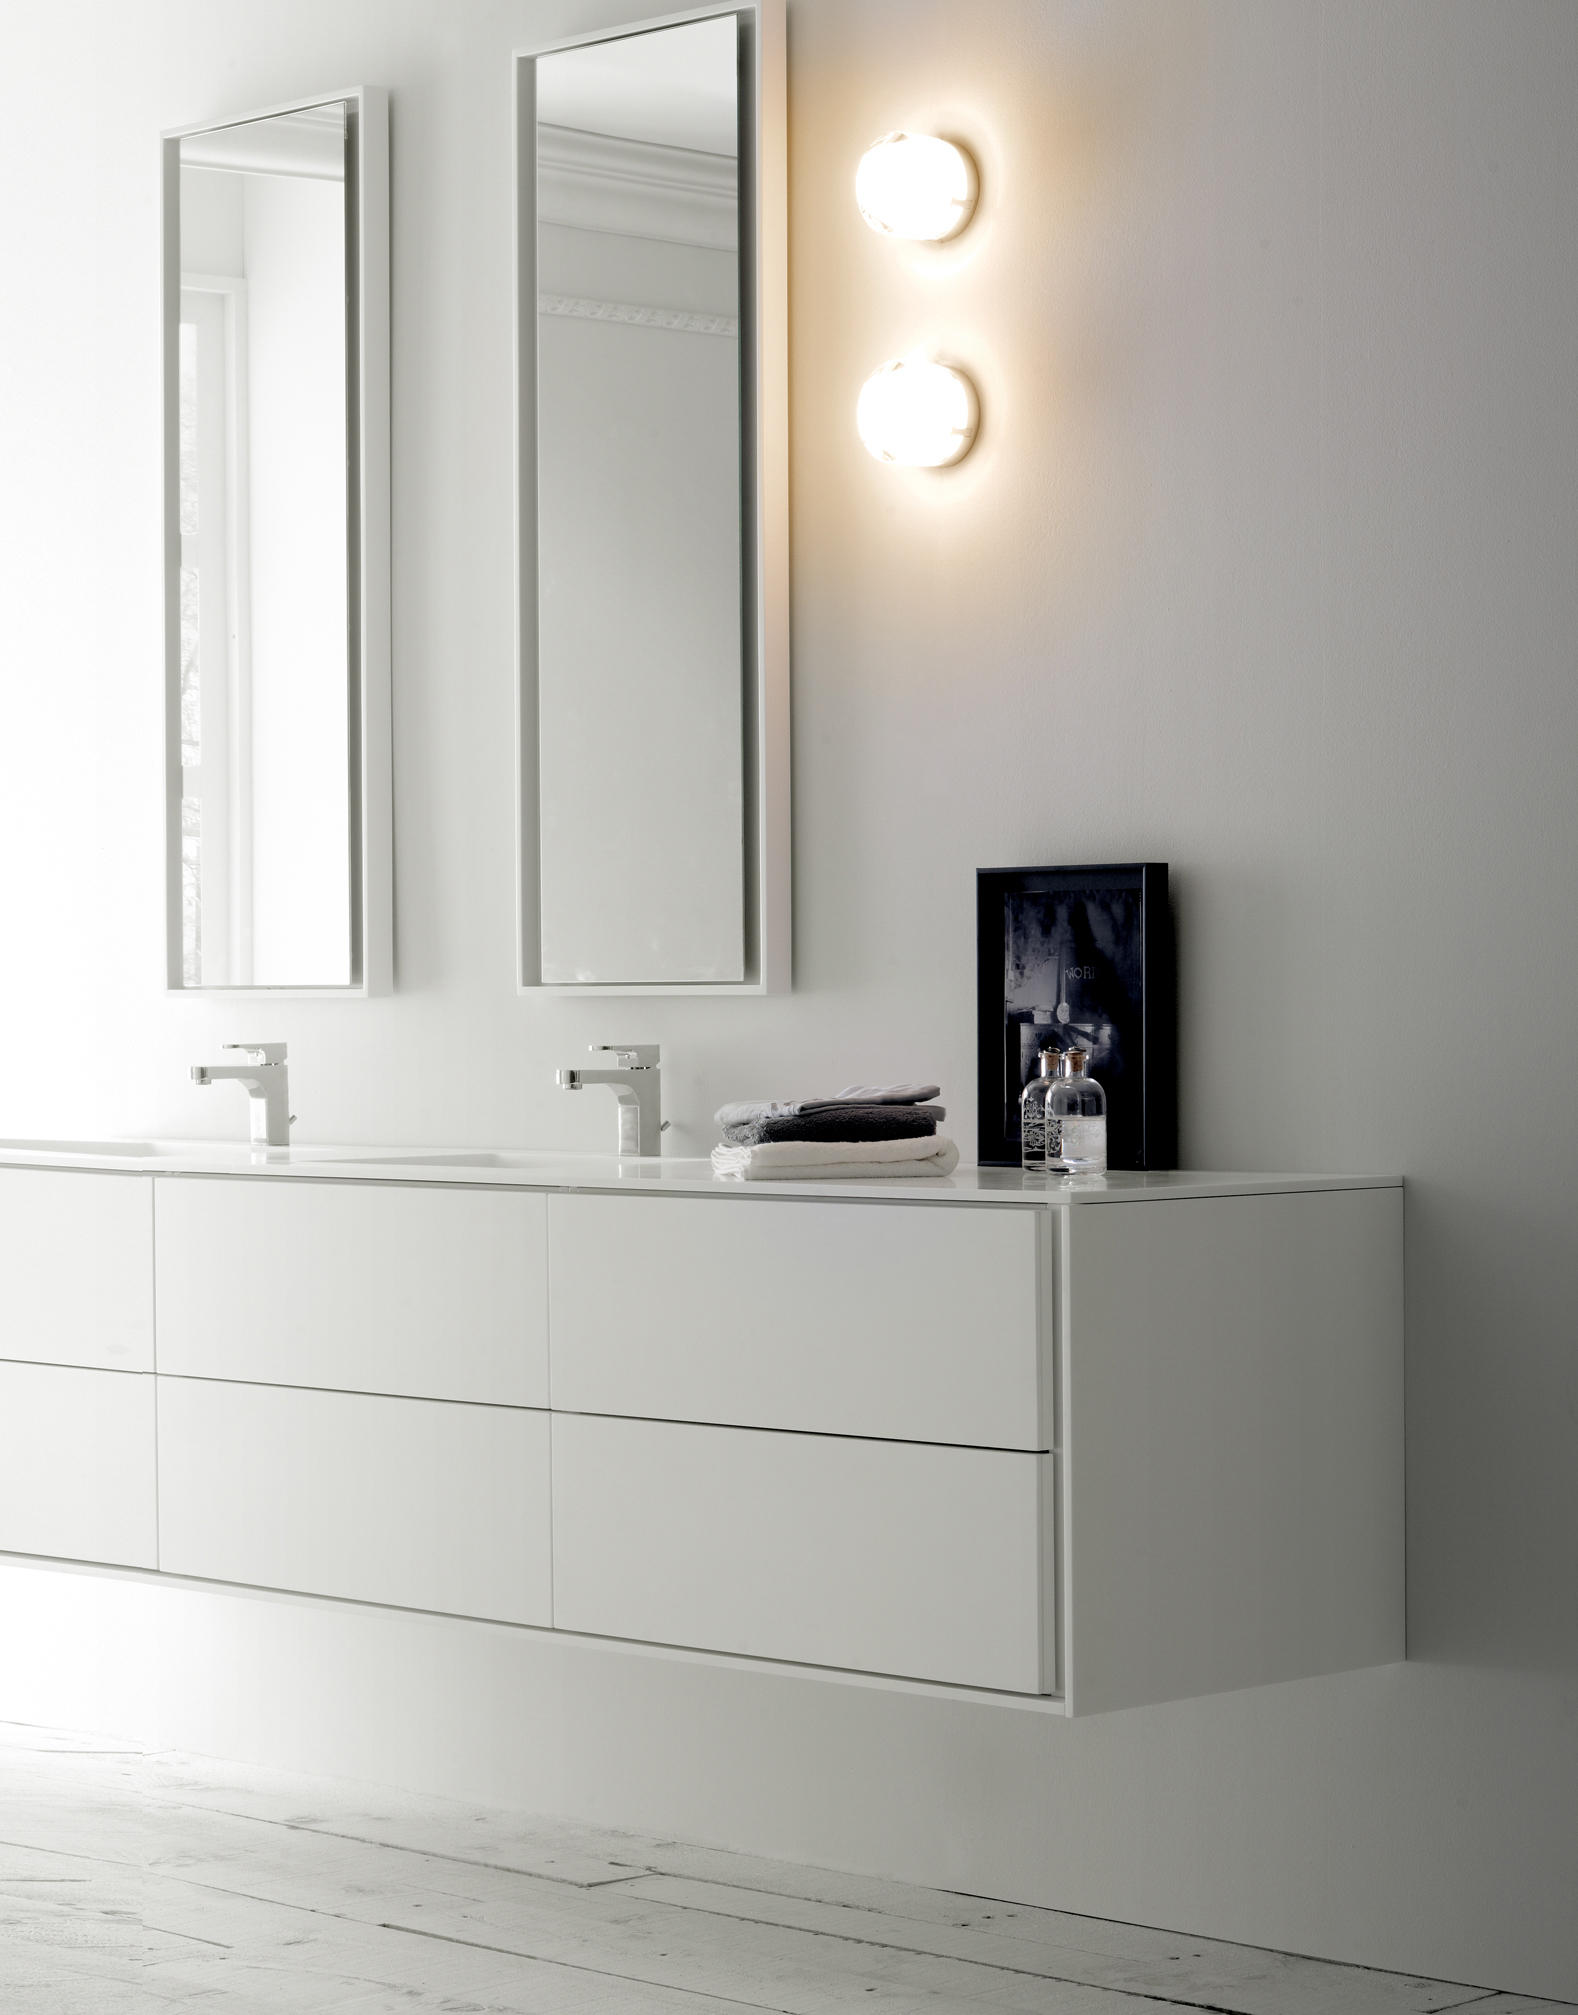 Forro meuble porte vasque meubles sous lavabo de codis for Meuble porte vasque